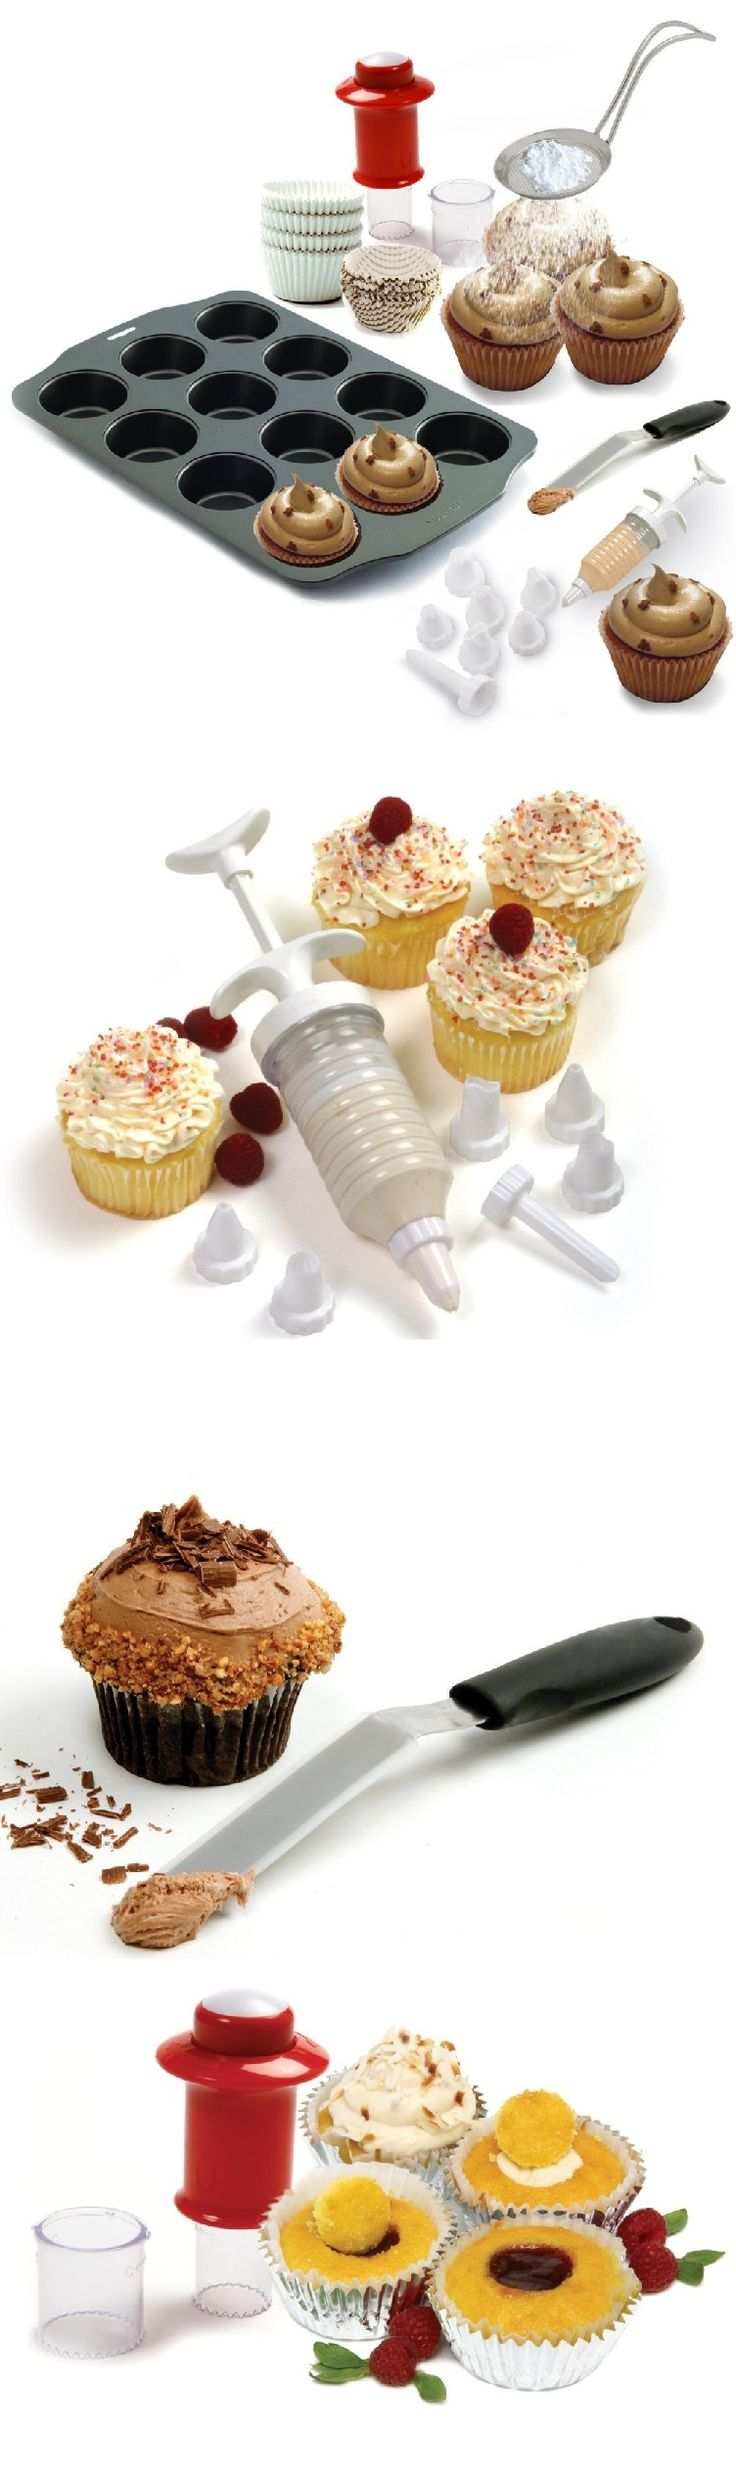 87 best Useful Kitchen Gadget images on Pinterest   Kitchen gadgets ...